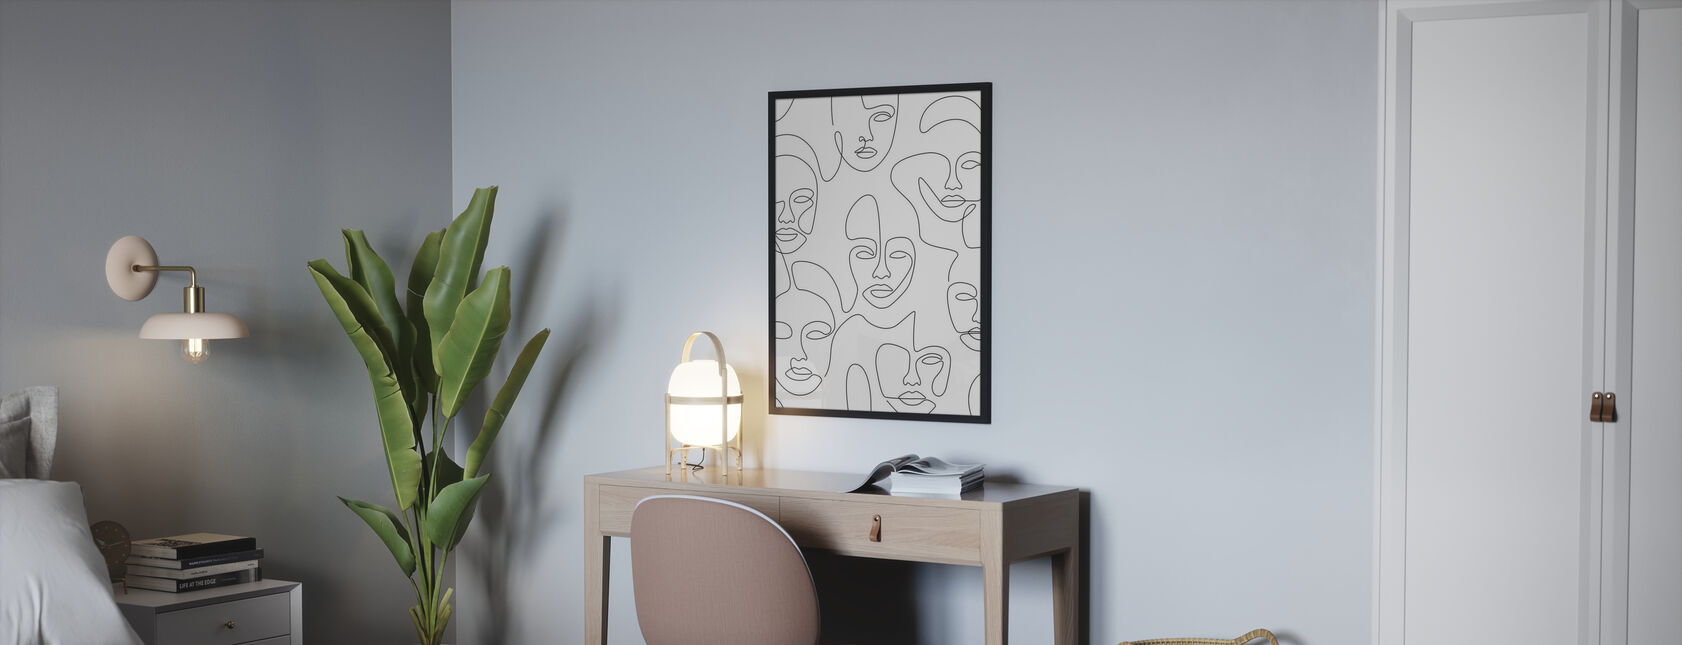 Beauty Portraits - Poster - Bedroom